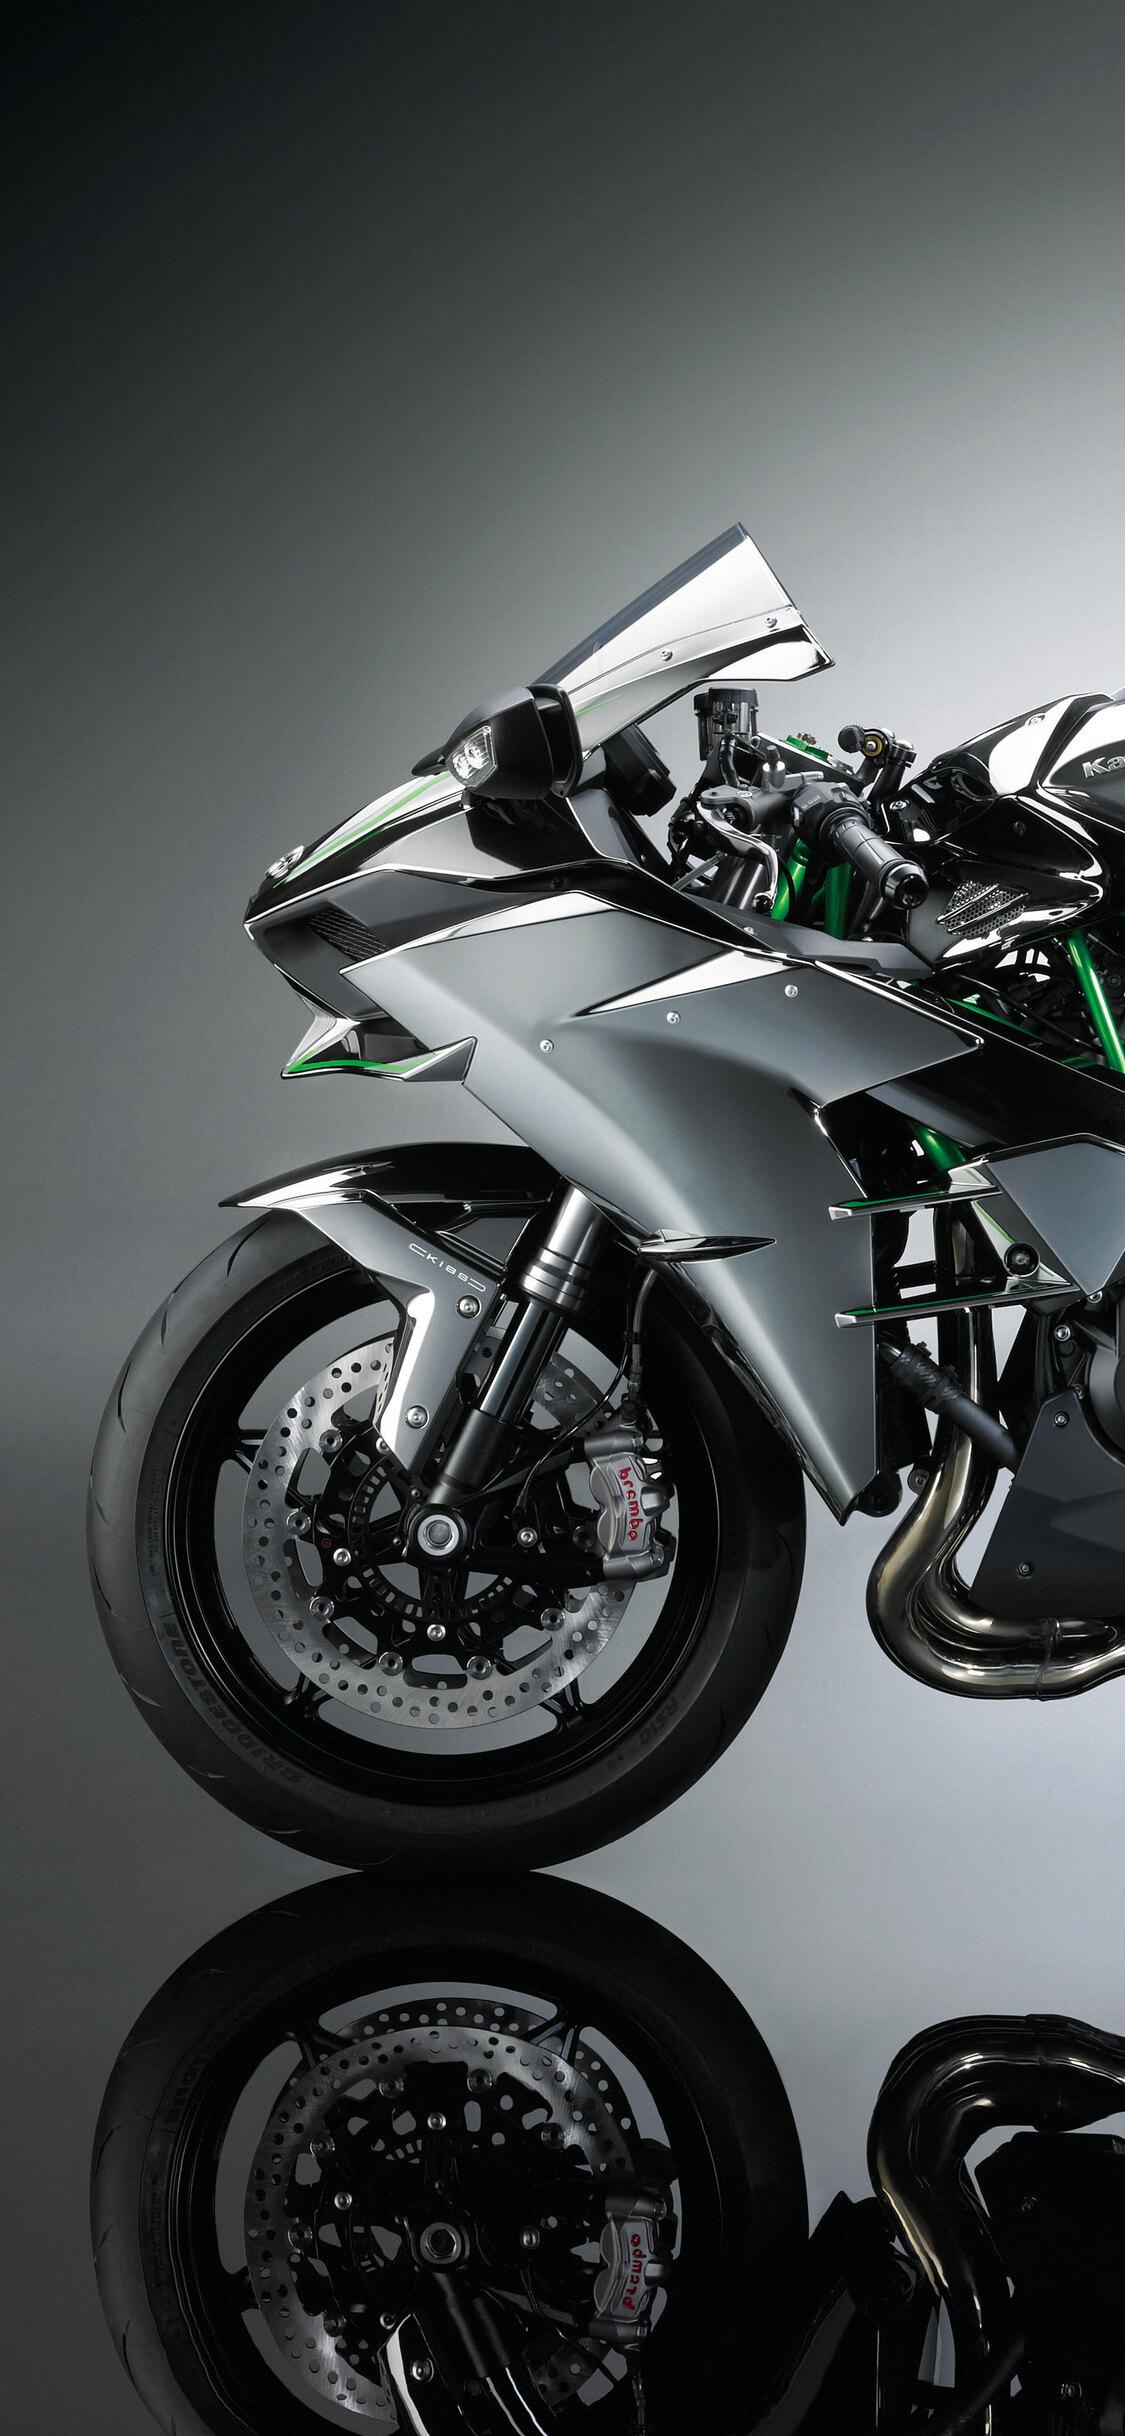 Kawasaki Ninja H2 4k Qu